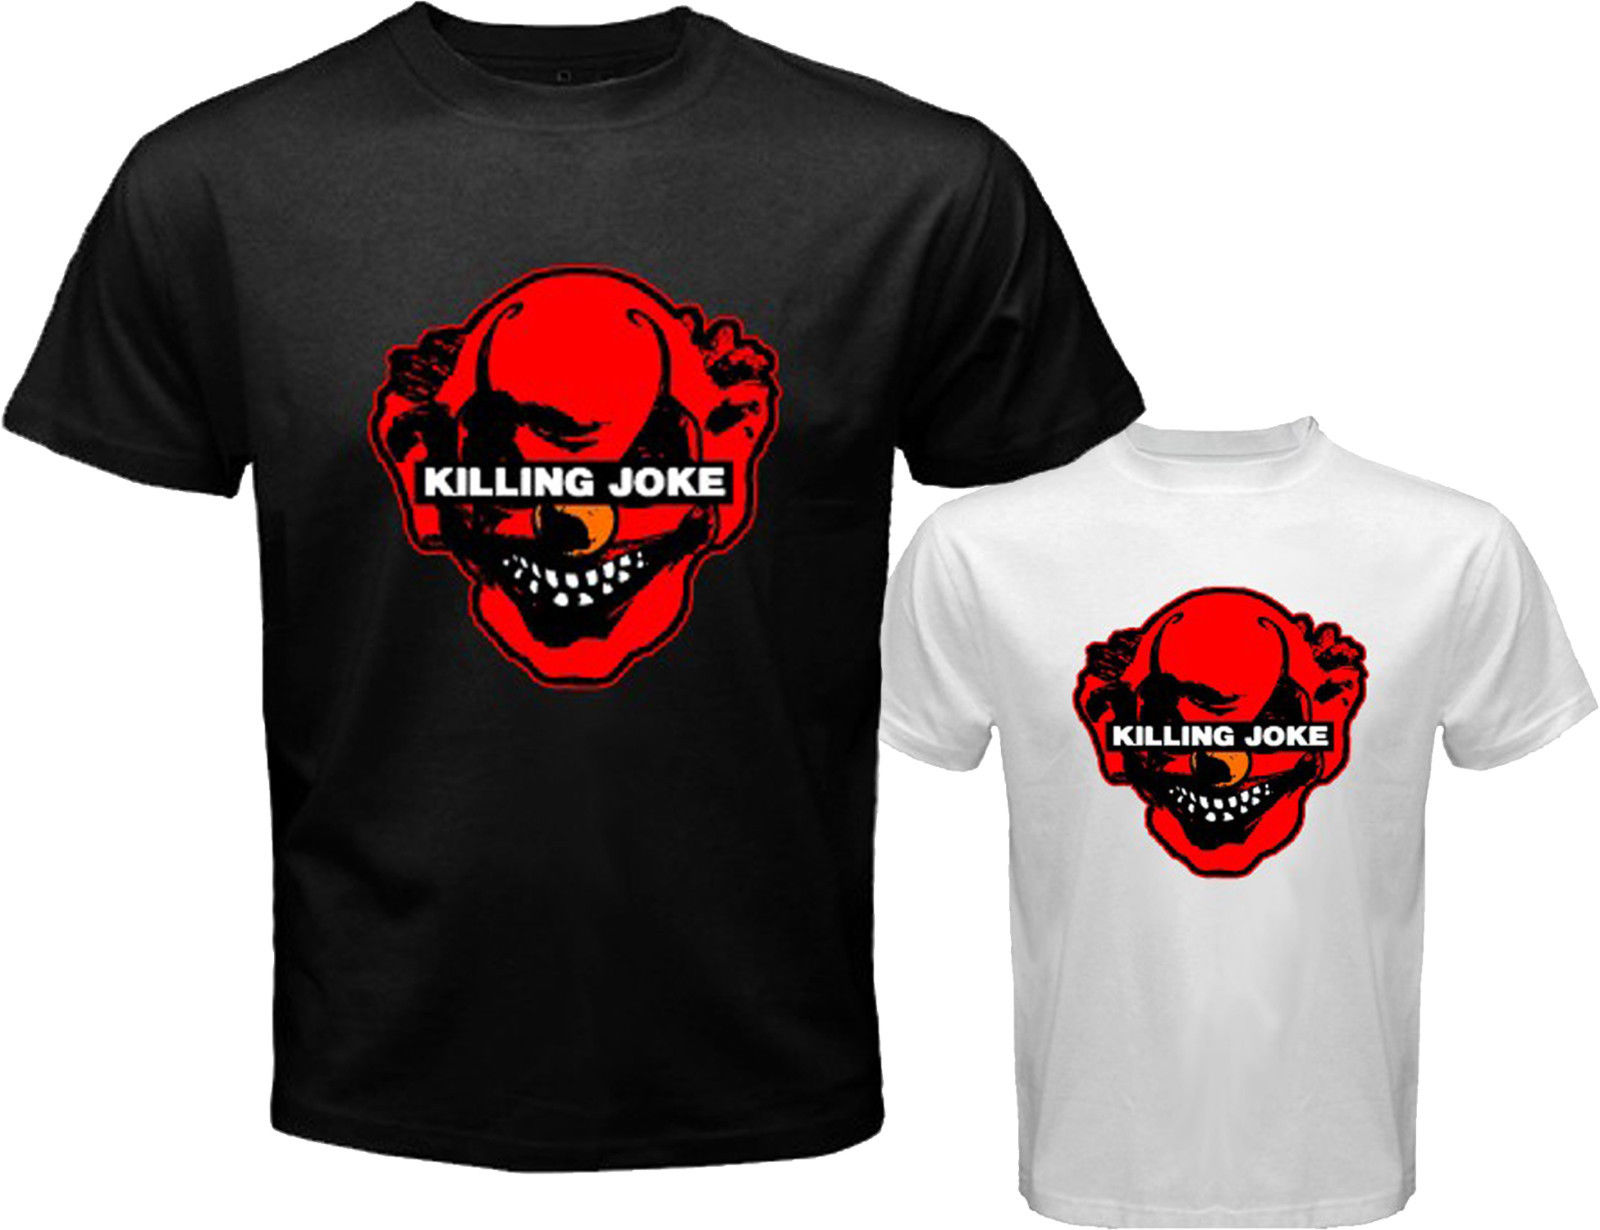 New KILLING JOKE Punk Rock Band Logo Mens White Black T-Shirt Size S to 3XL